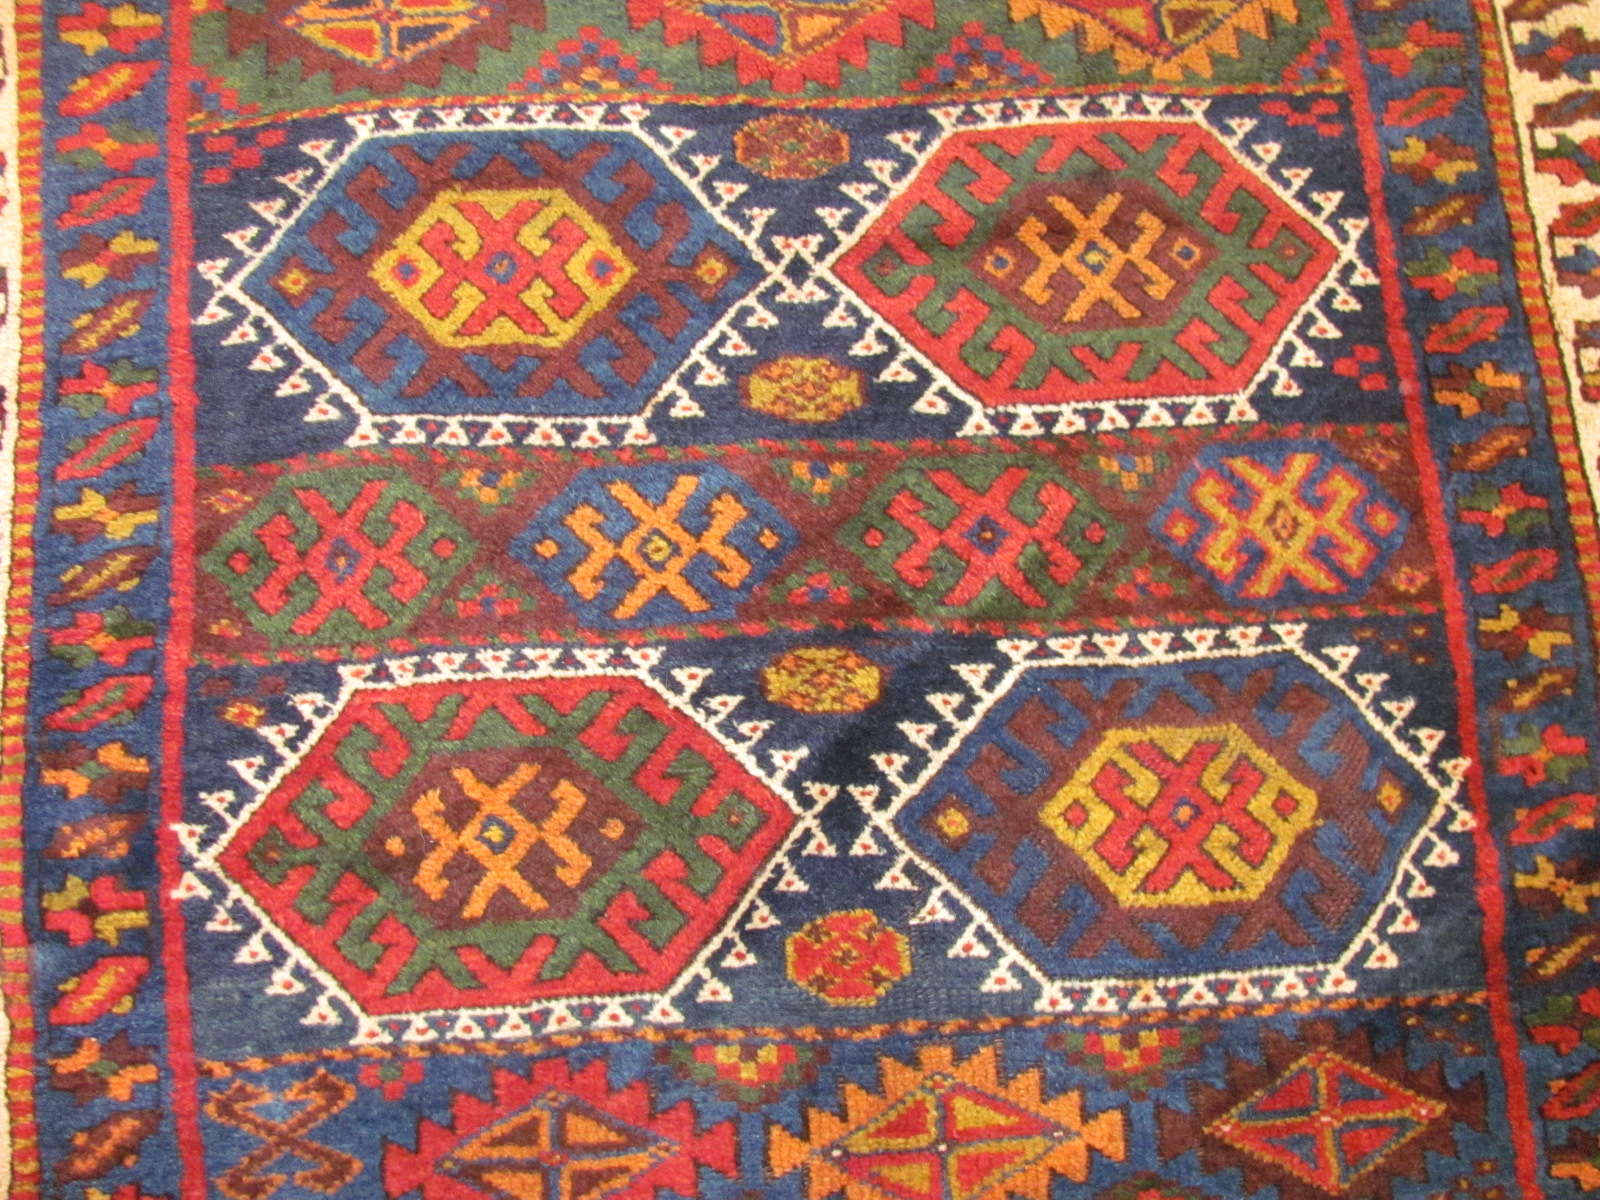 24554 antique persian joffee kurd rug 4,9x7,9 -2